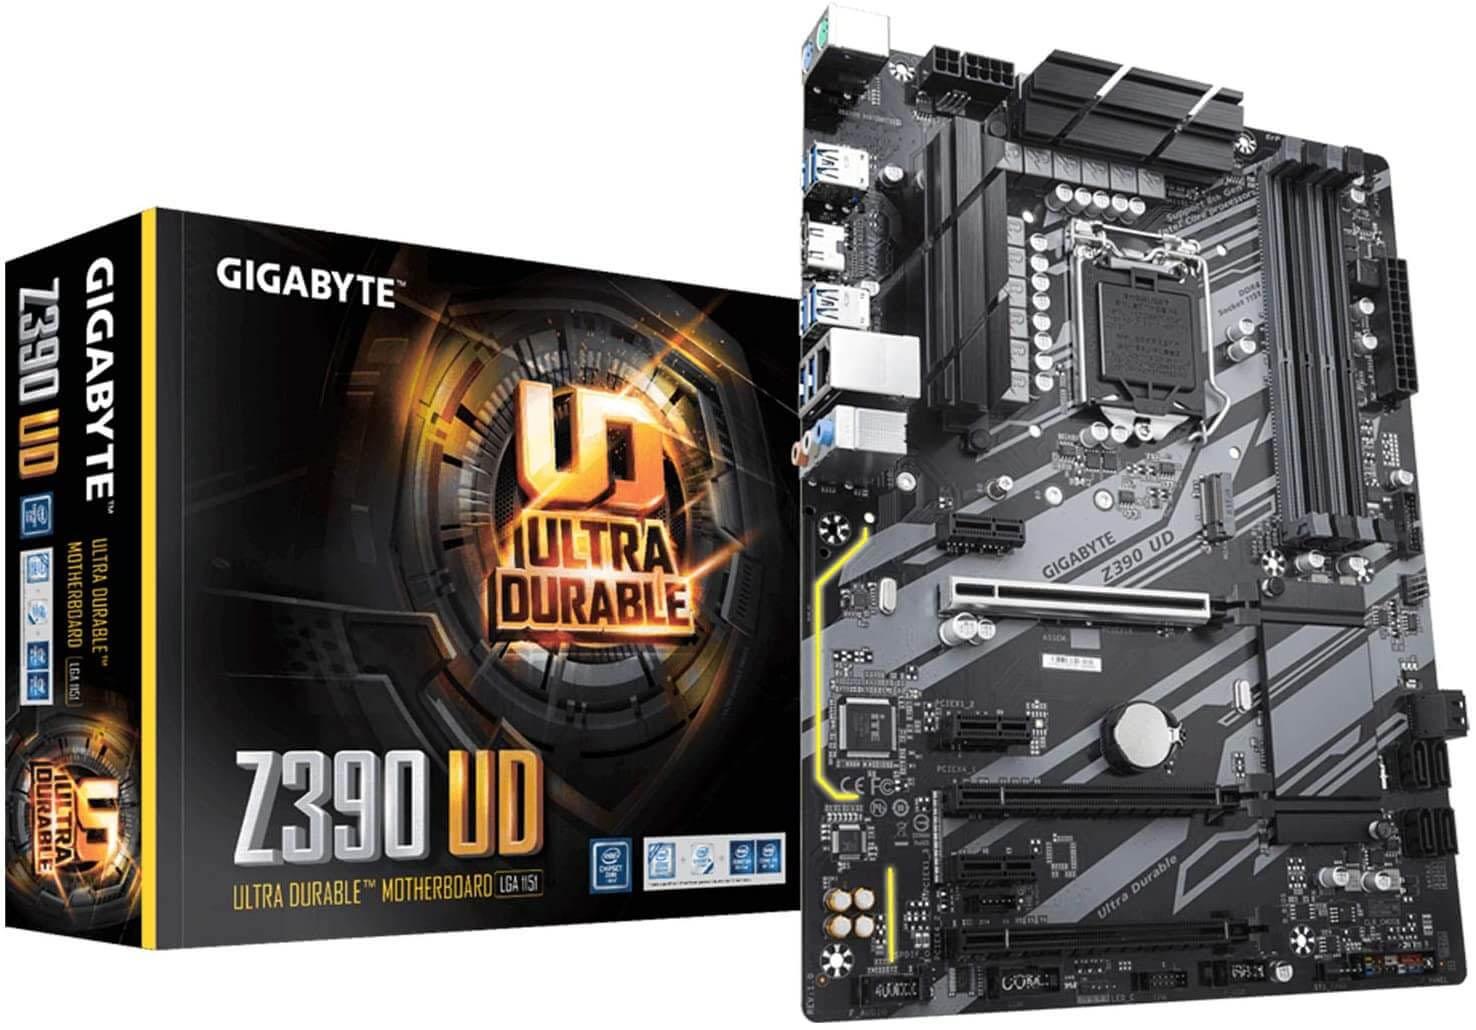 Gigabyte Z390 UD Review: Best 9th Gen Mobo Under $200?